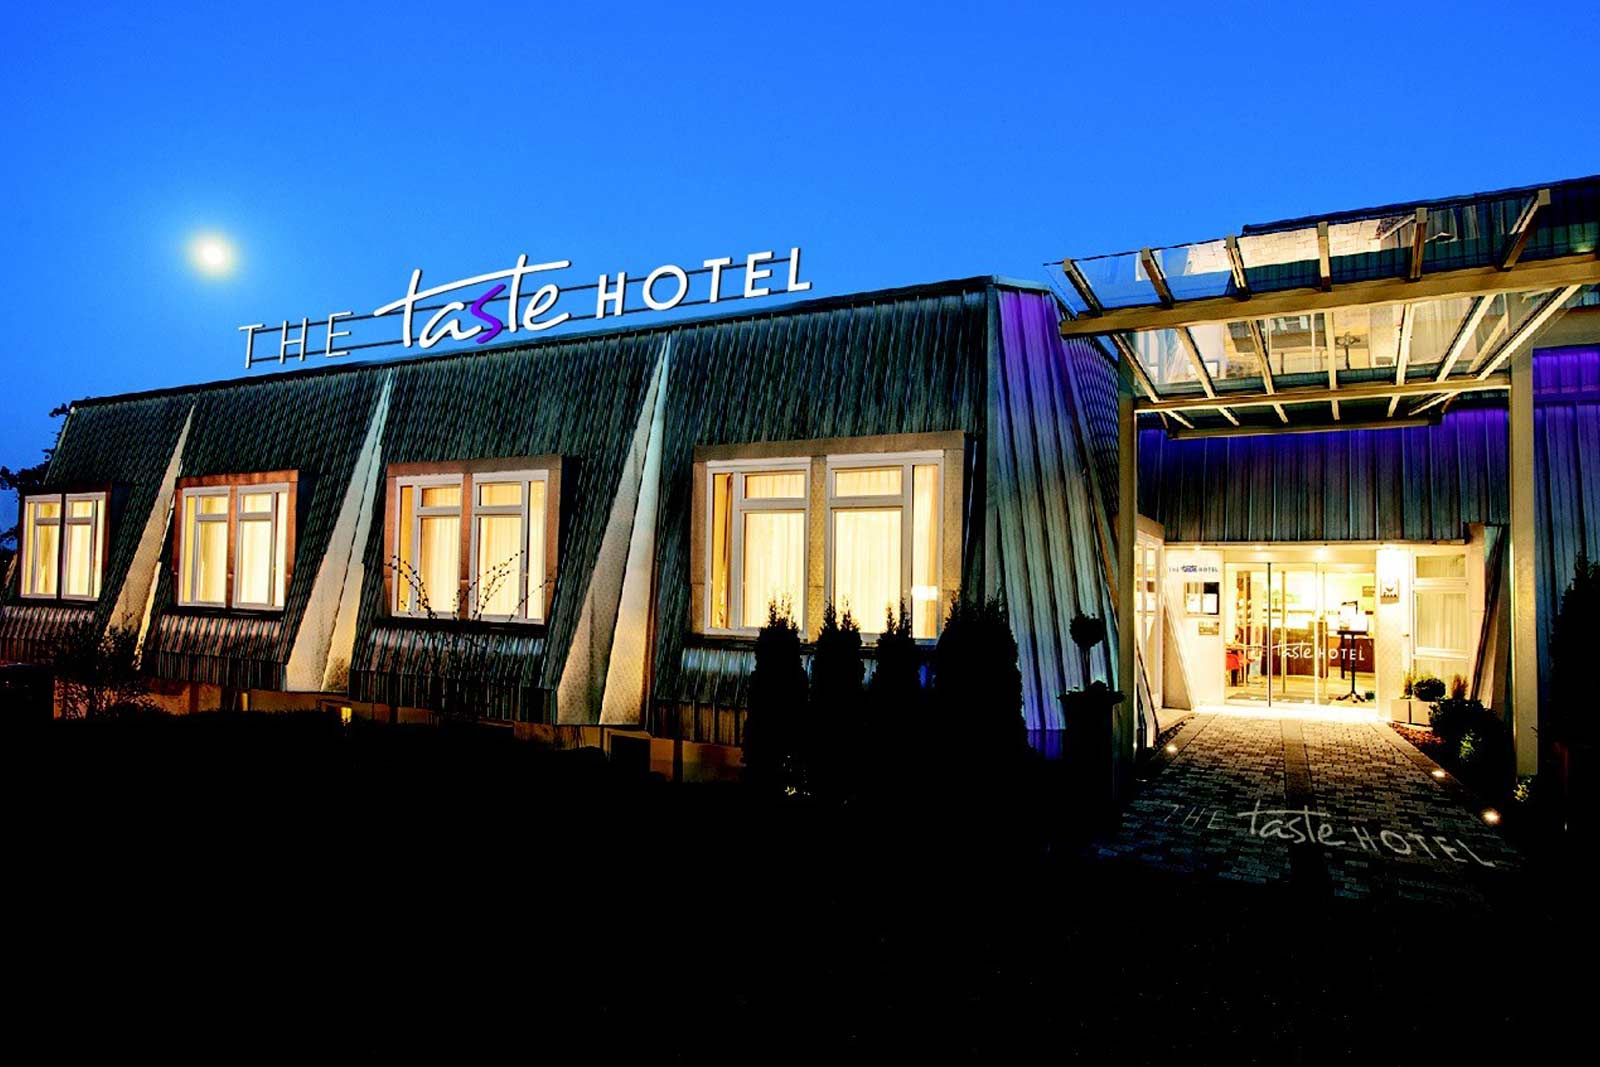 Bestes Hotel Heidenheim